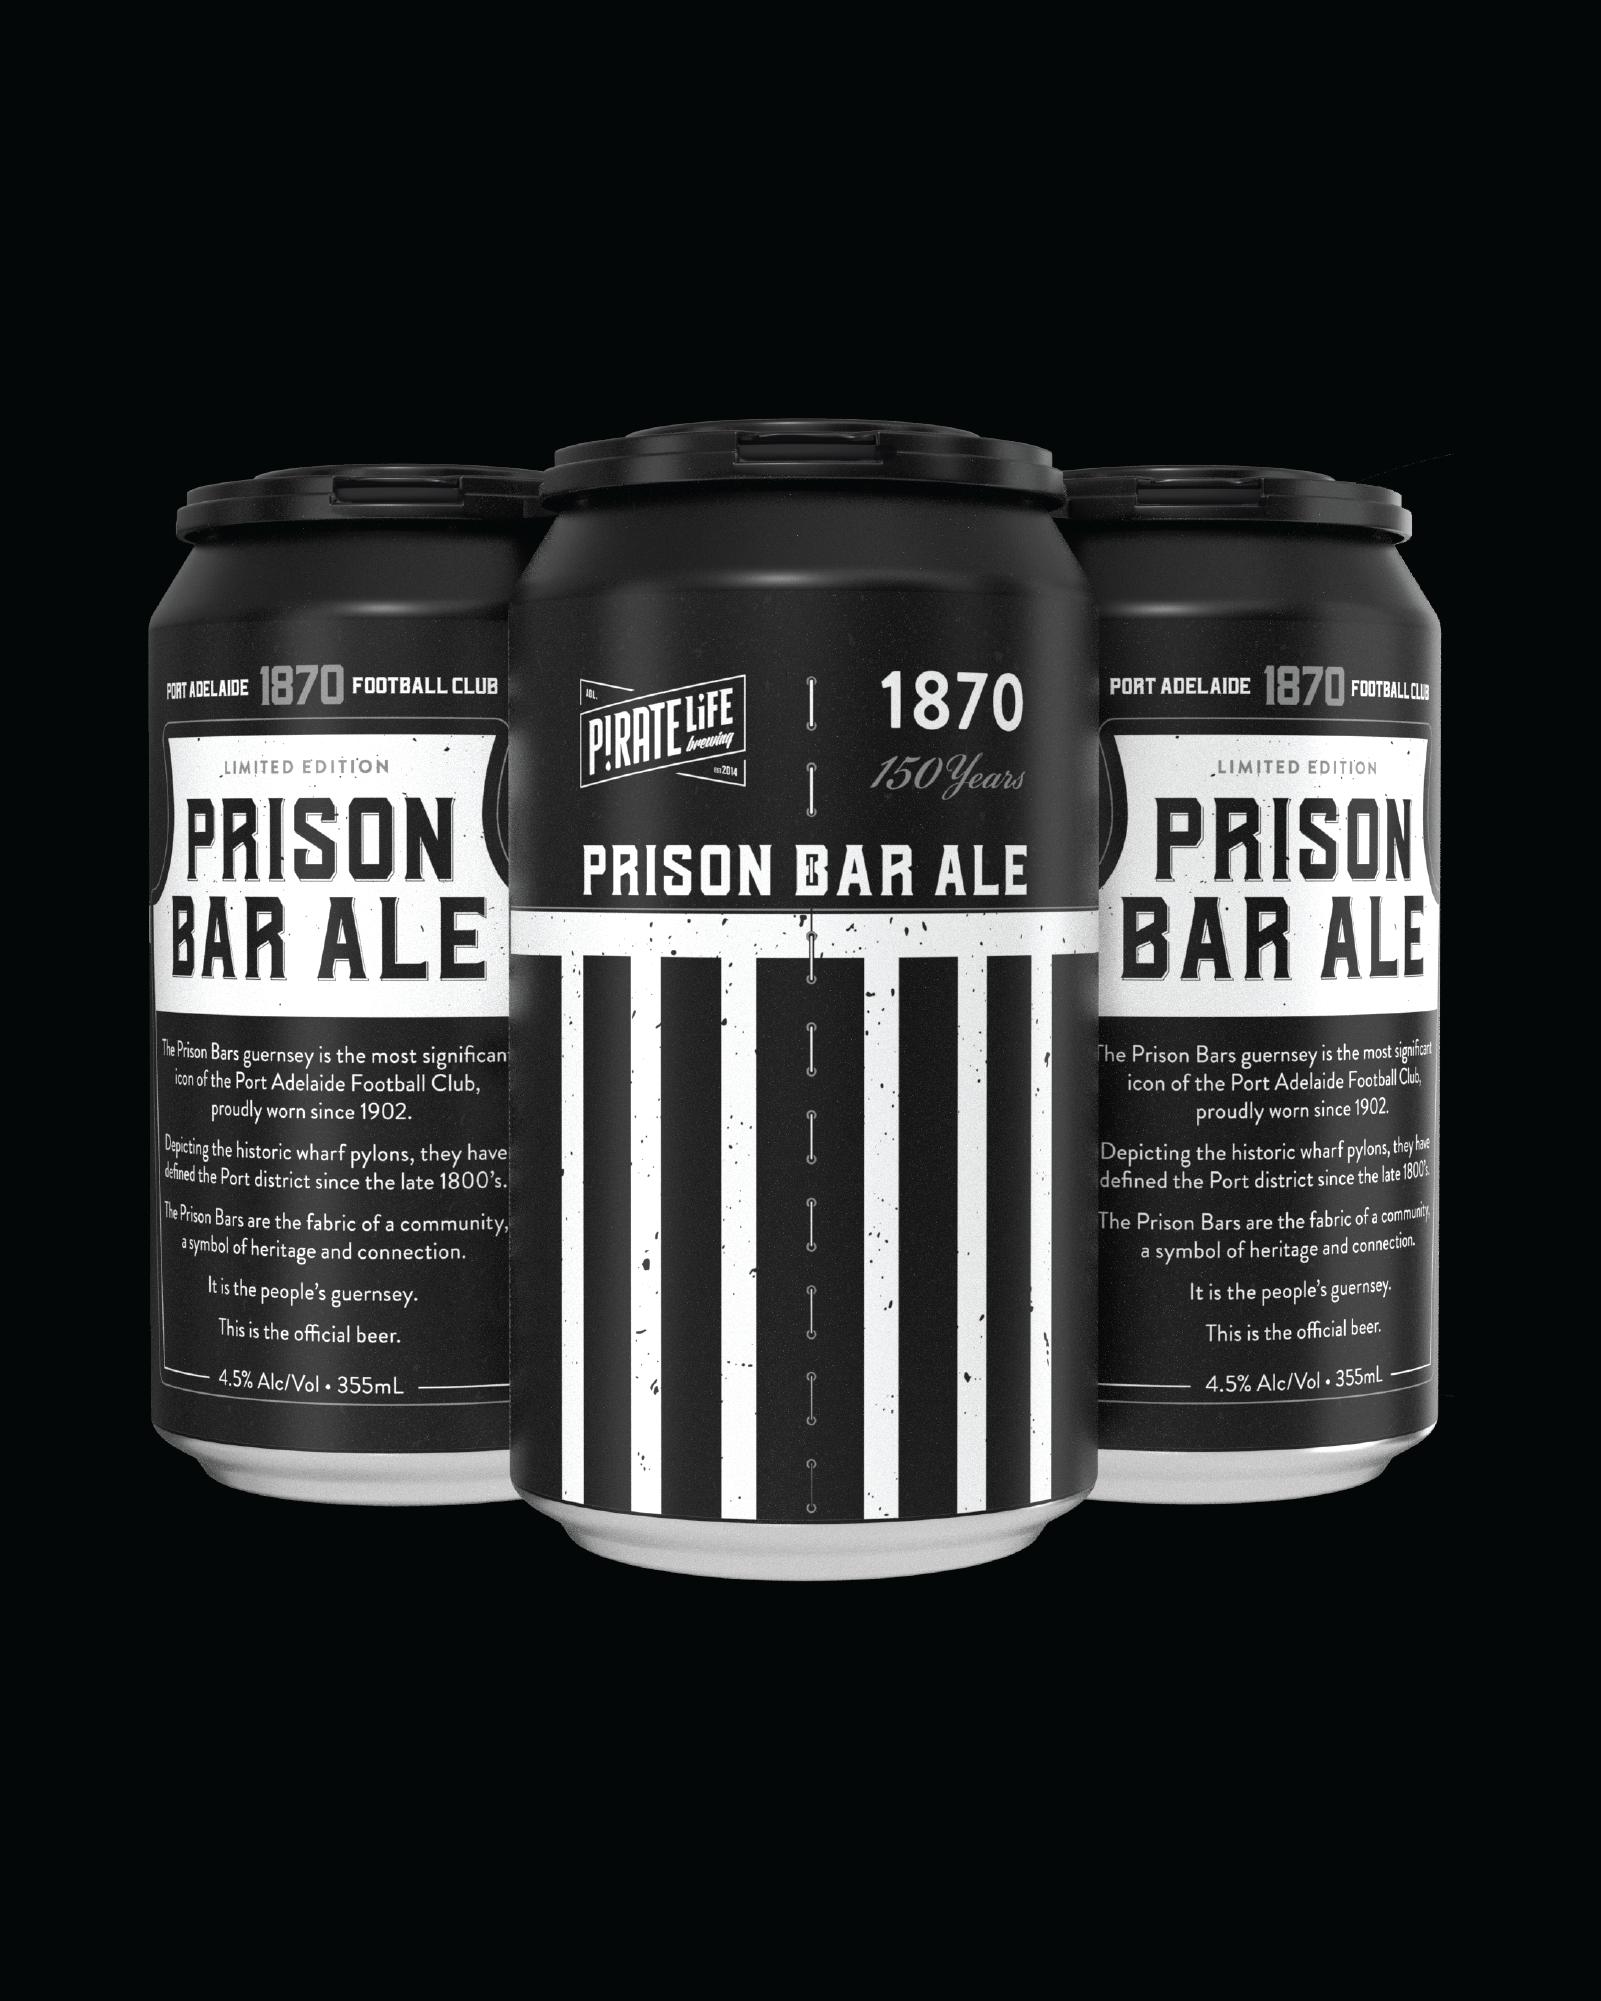 Prison_Bar_Ale-02